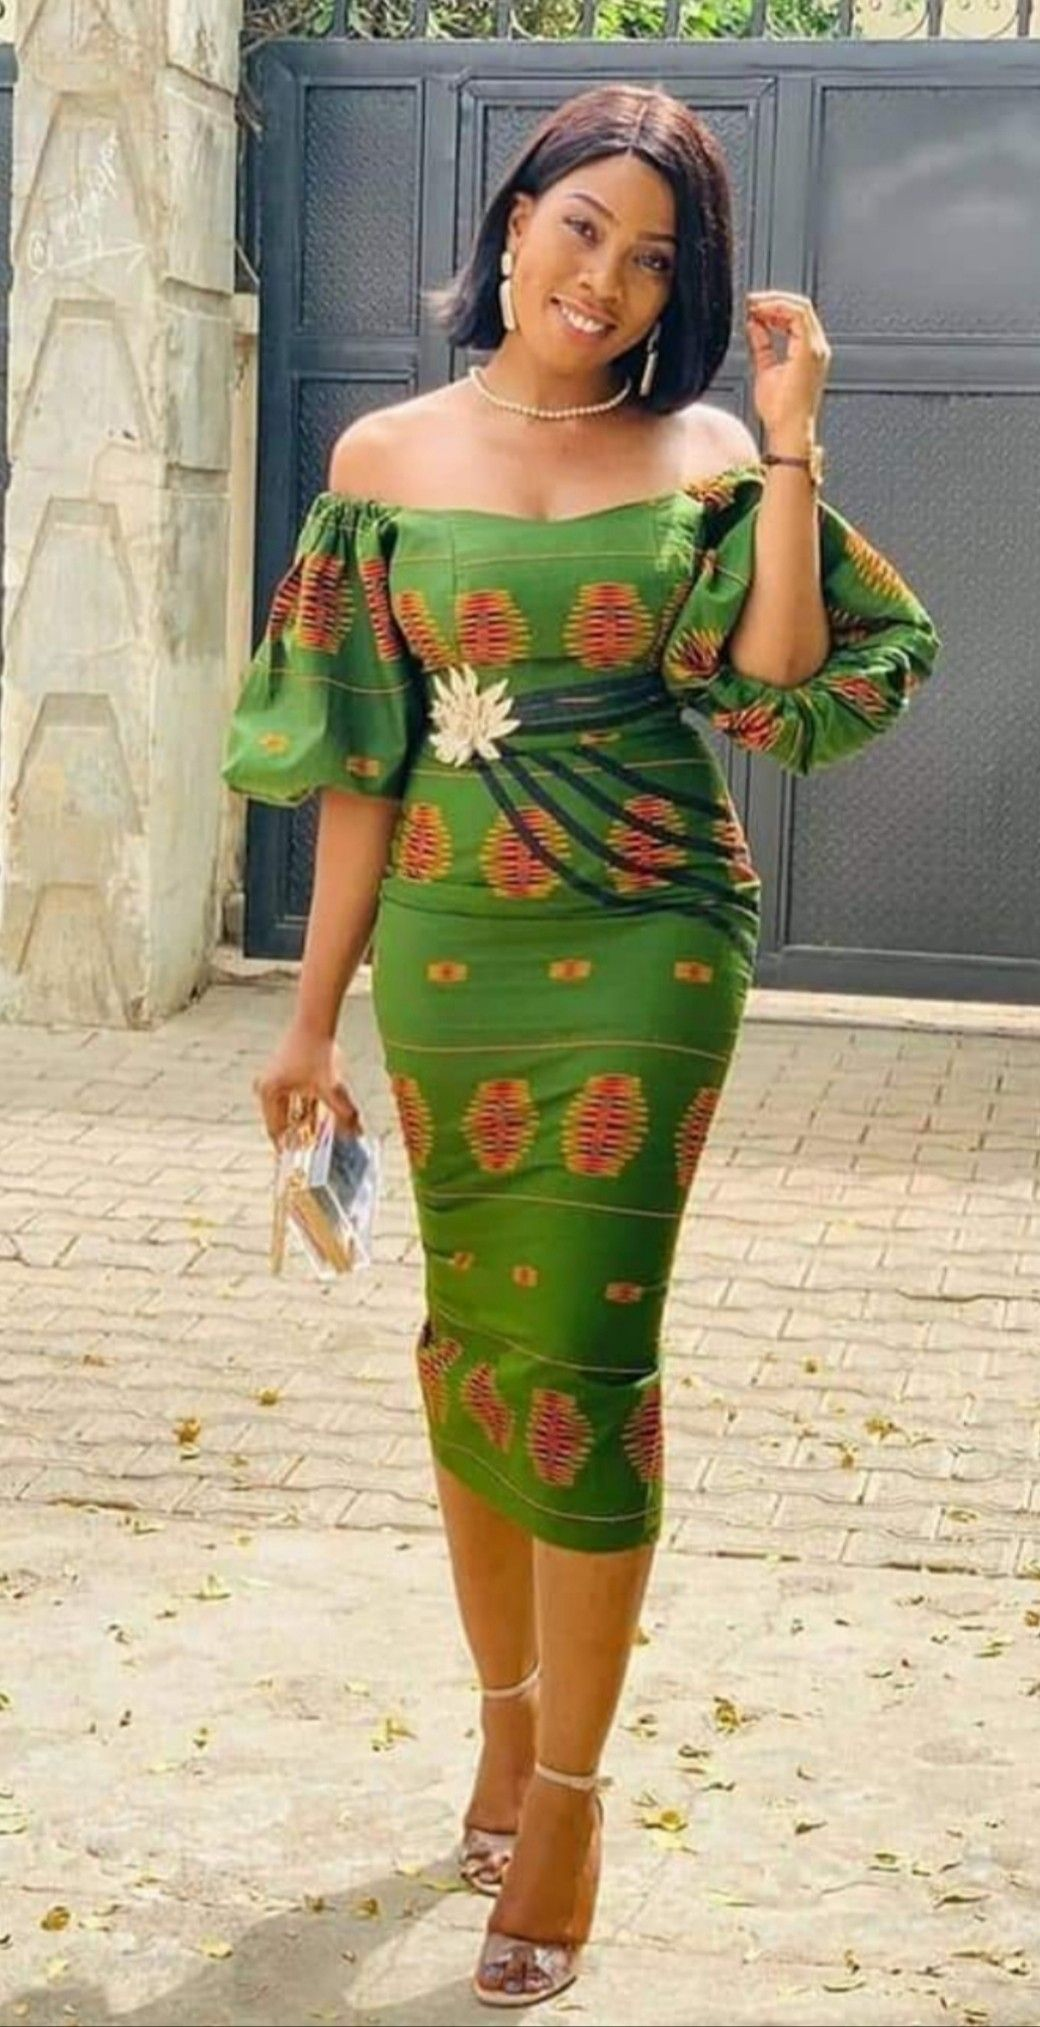 Pin By Aminata Ndao On Wax Tendance In 2020 African Dresses For Women Ankara Dress Styles African Attire